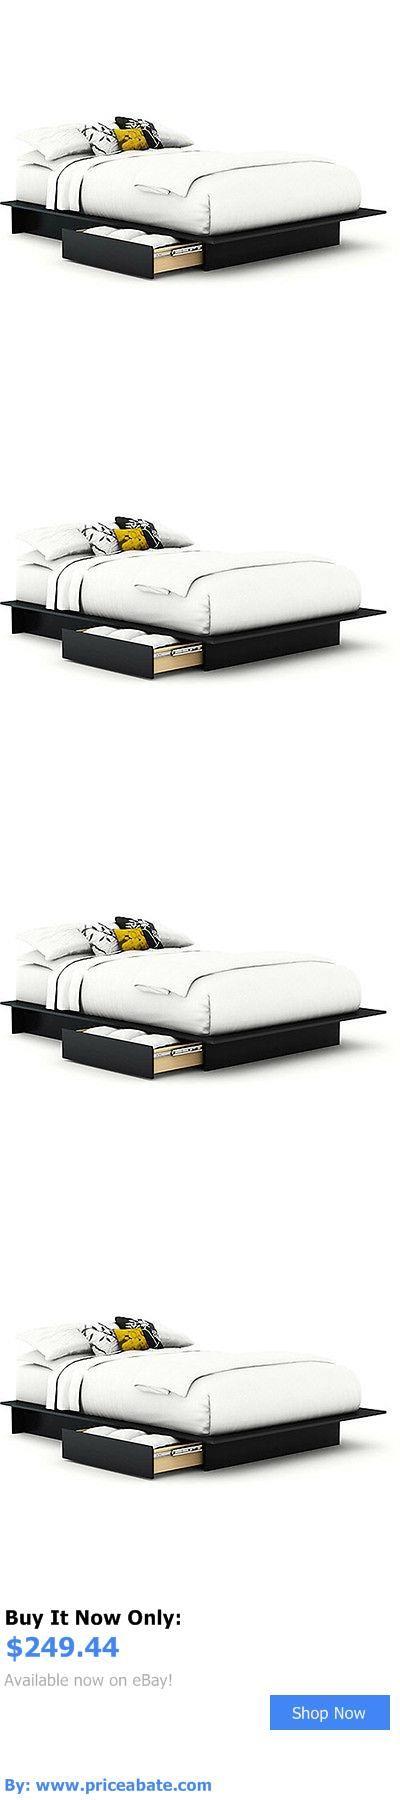 Bedding: Bed Bedroom Storage Platform Furniture Full Queen Size Mattress Set Frame BUY IT NOW ONLY: $249.44 #priceabateBedding OR #priceabate